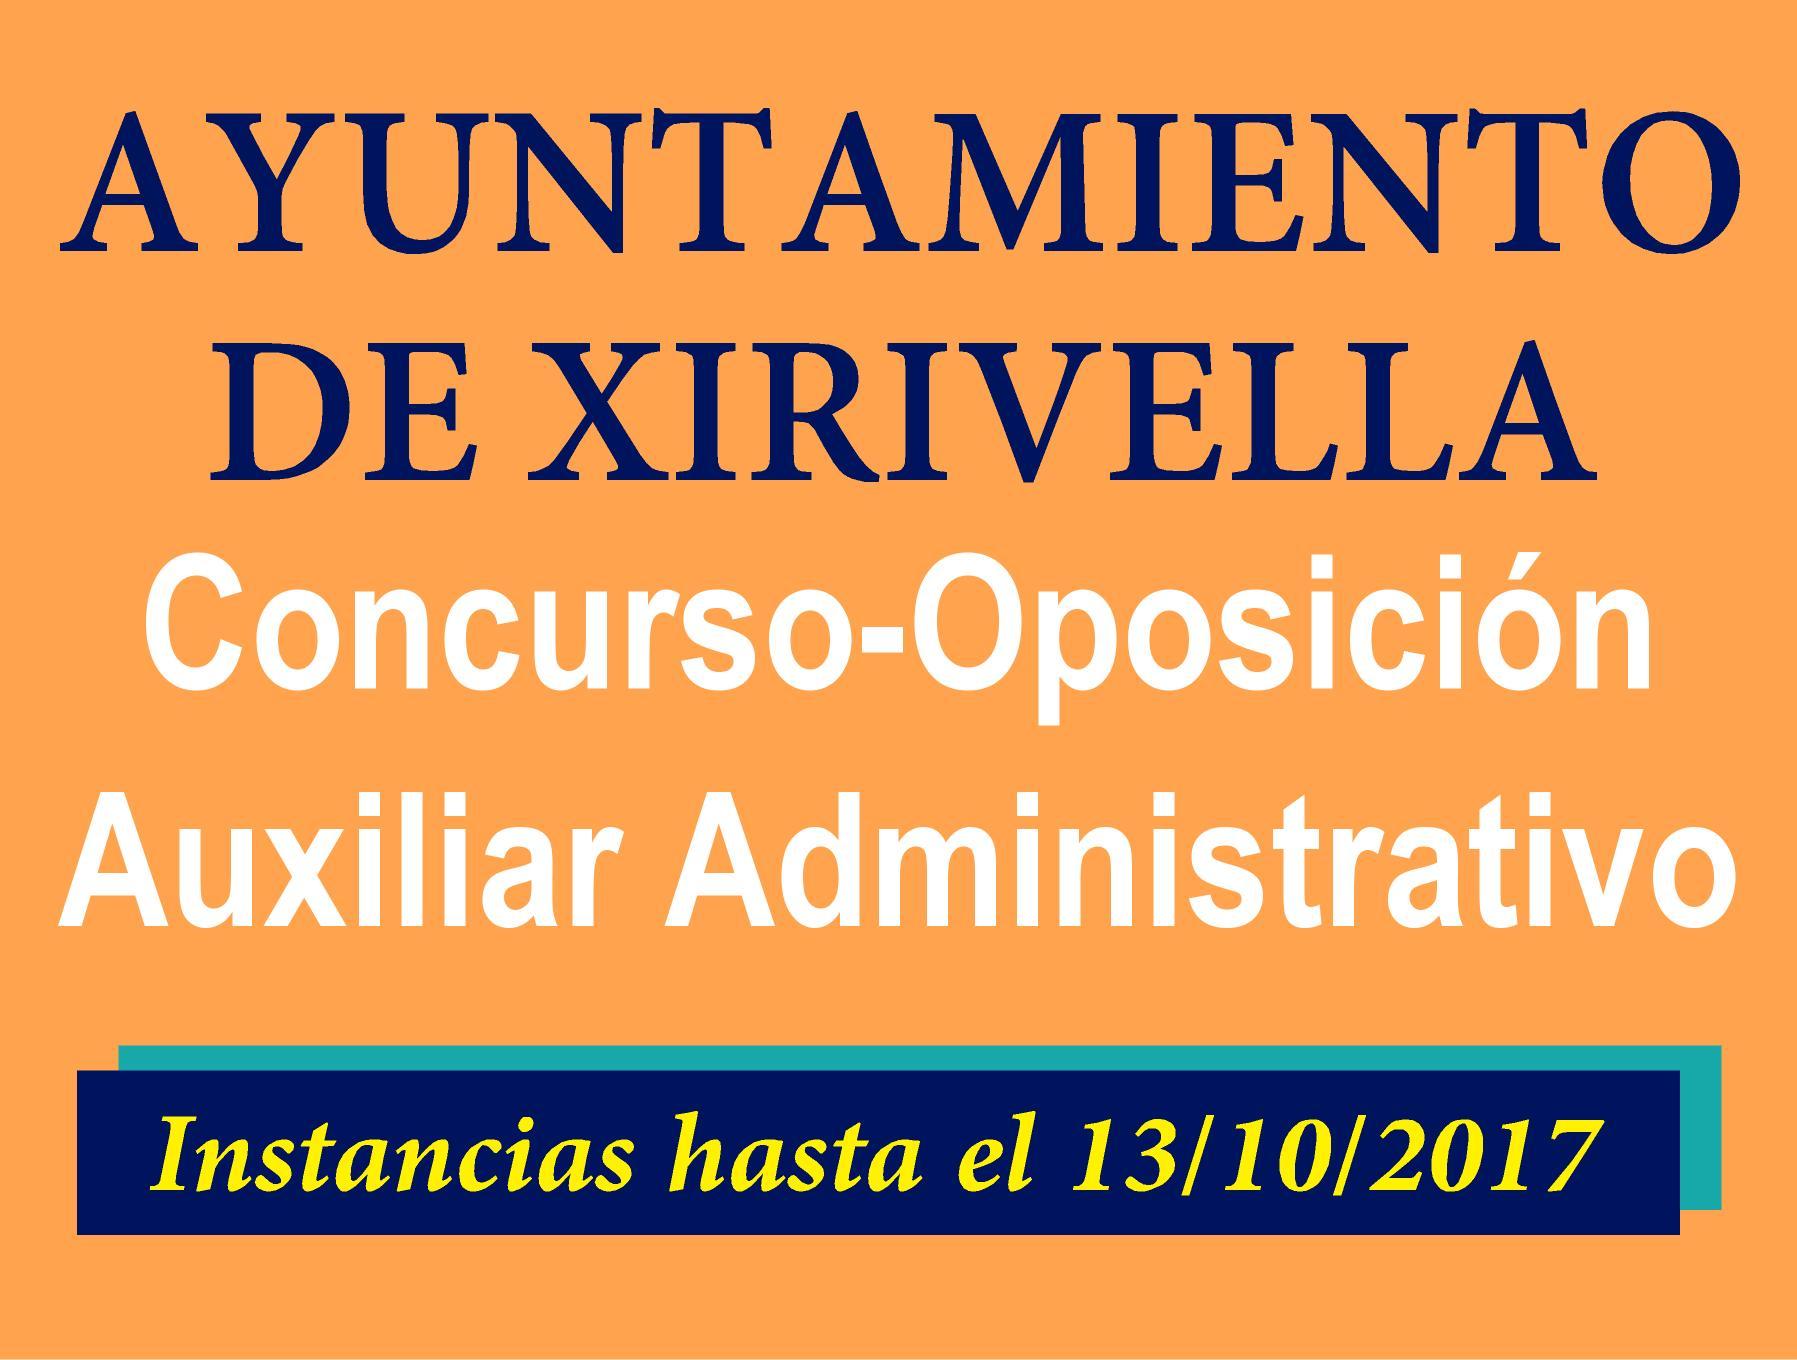 Auxiliar Administrativo Xirivella